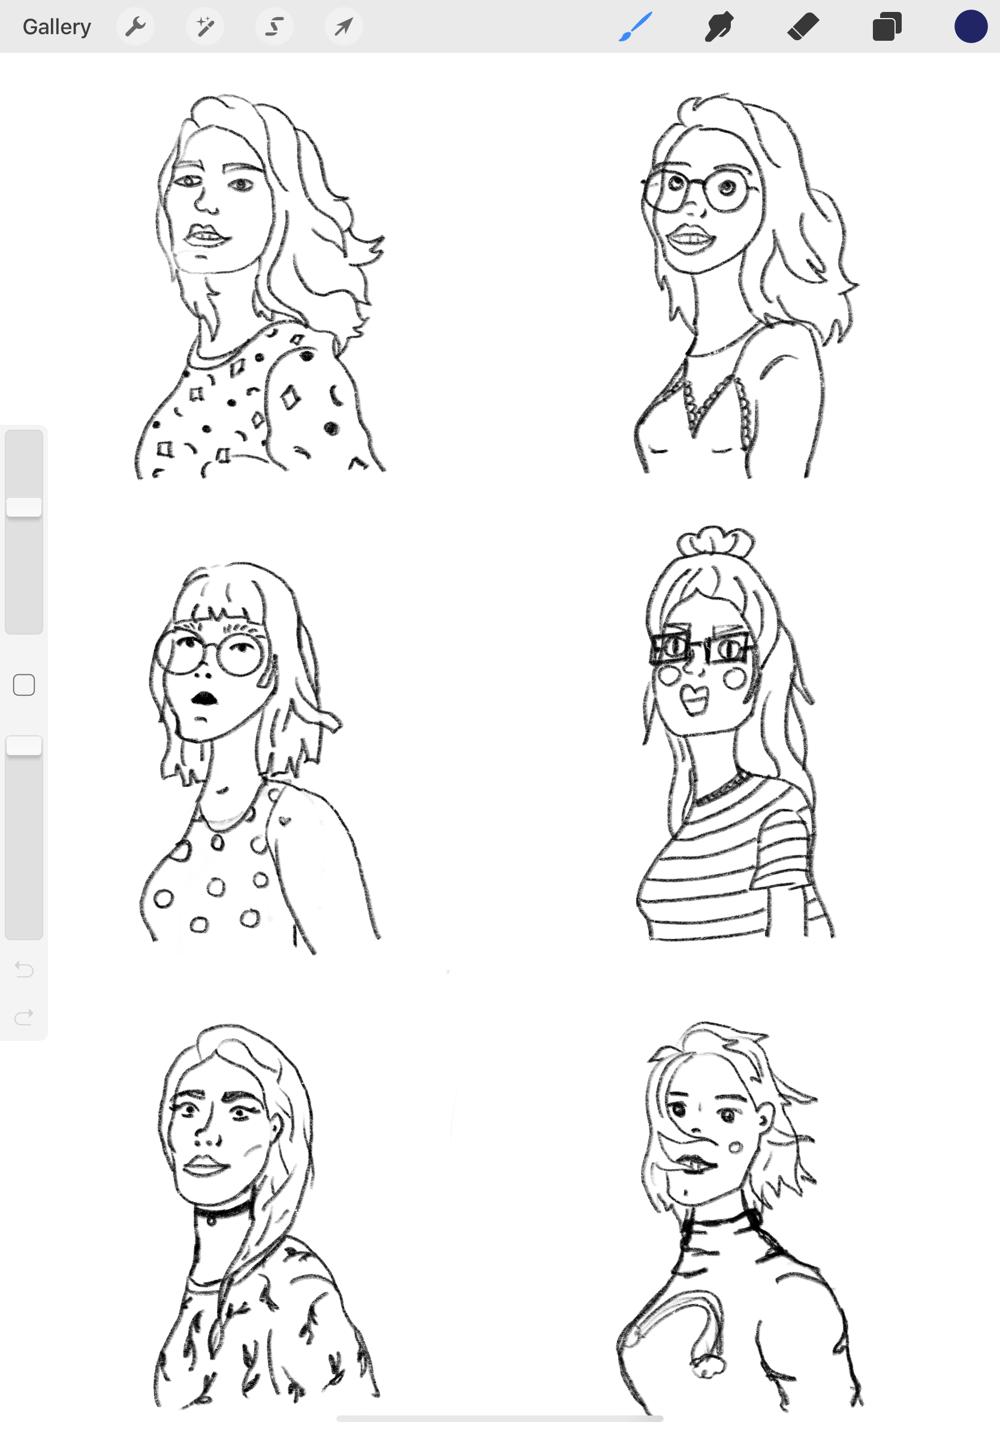 Exploring portrait illustration - image 5 - student project